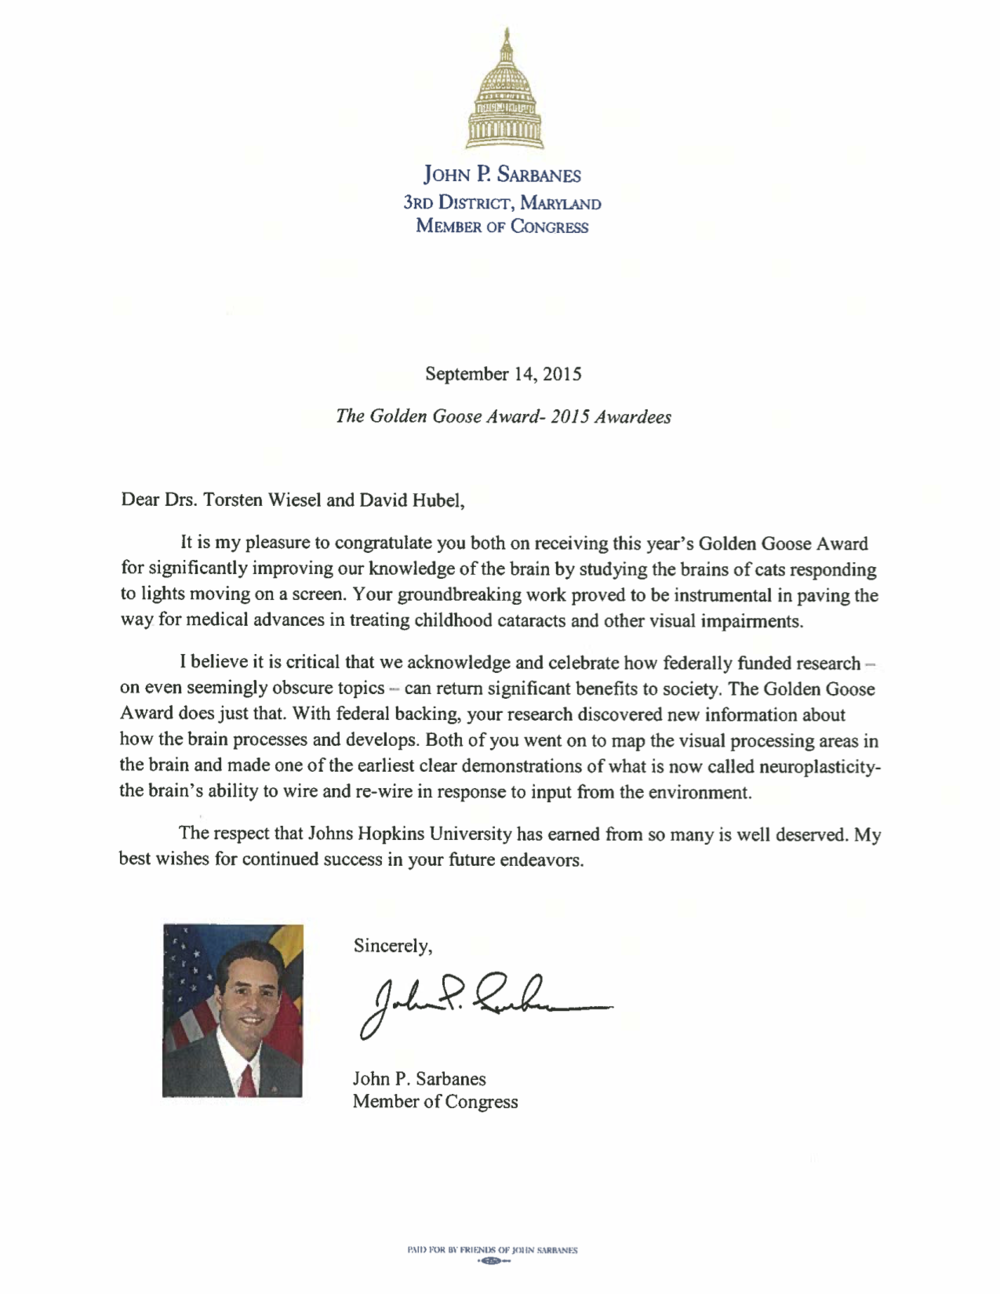 Congressman John P. Sarbanes Letter of Congratulations